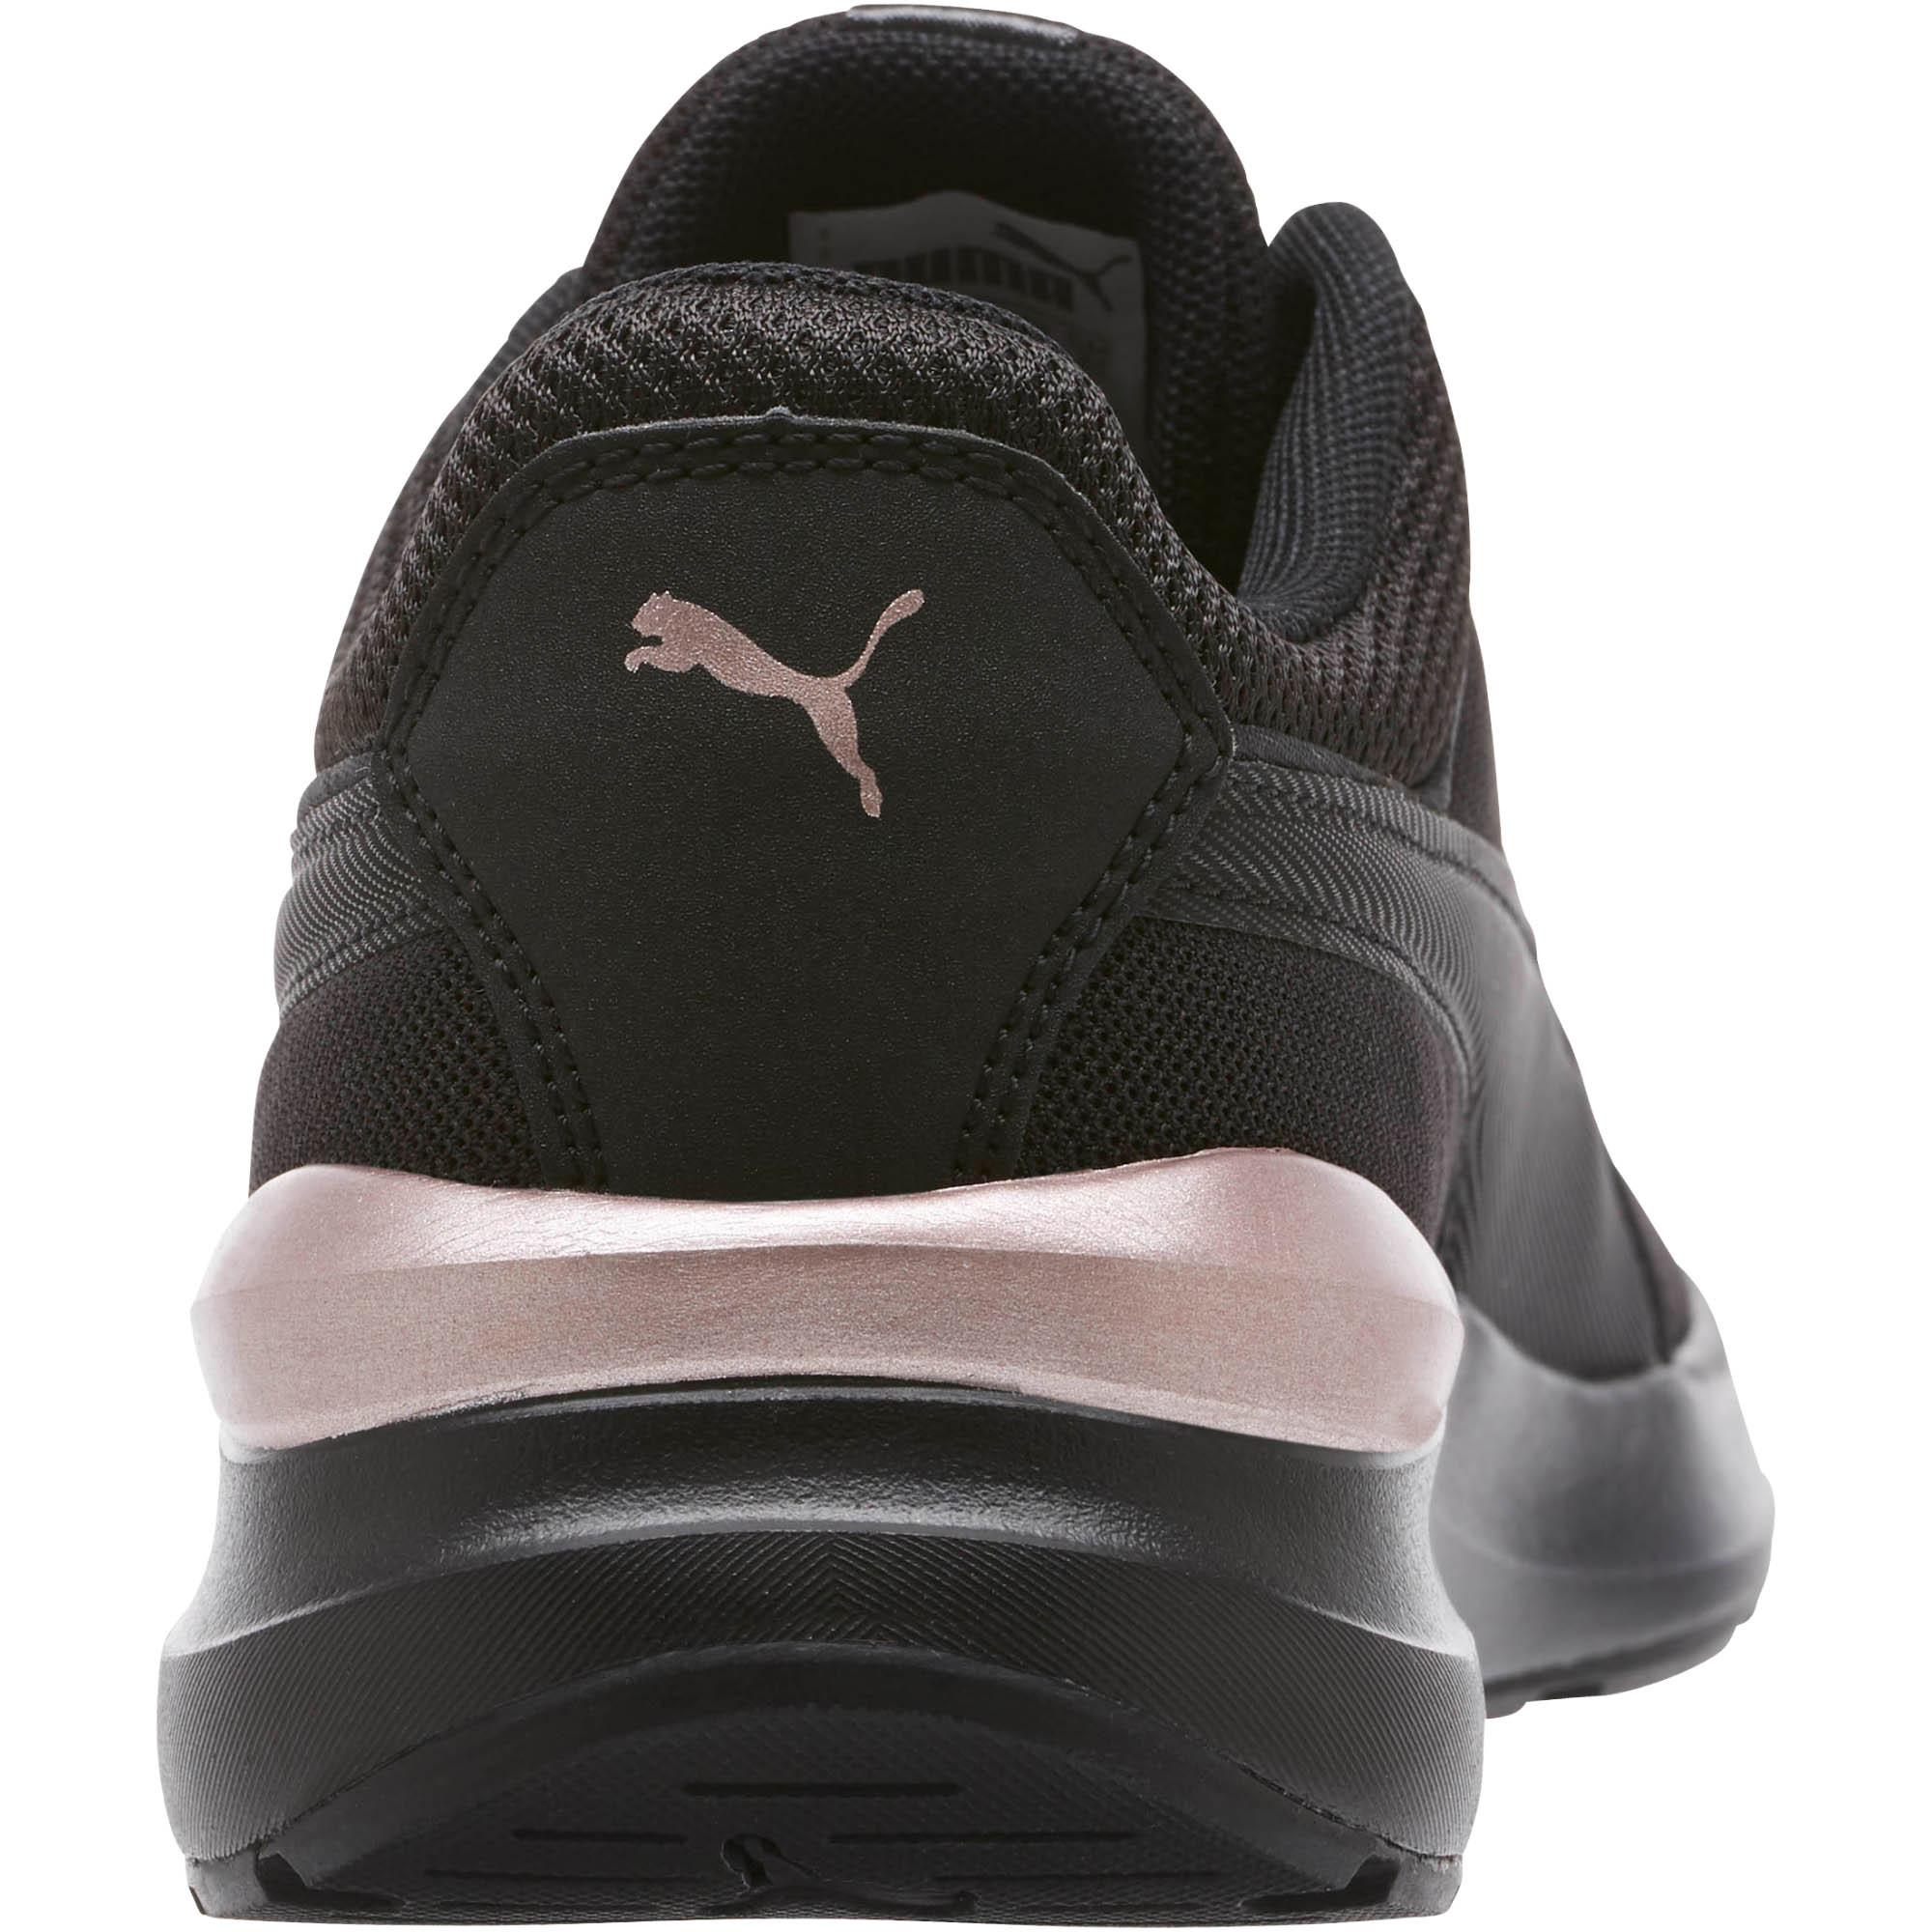 PUMA-Adela-Mesh-Women-s-Sneakers-Women-Shoe-Basics thumbnail 8